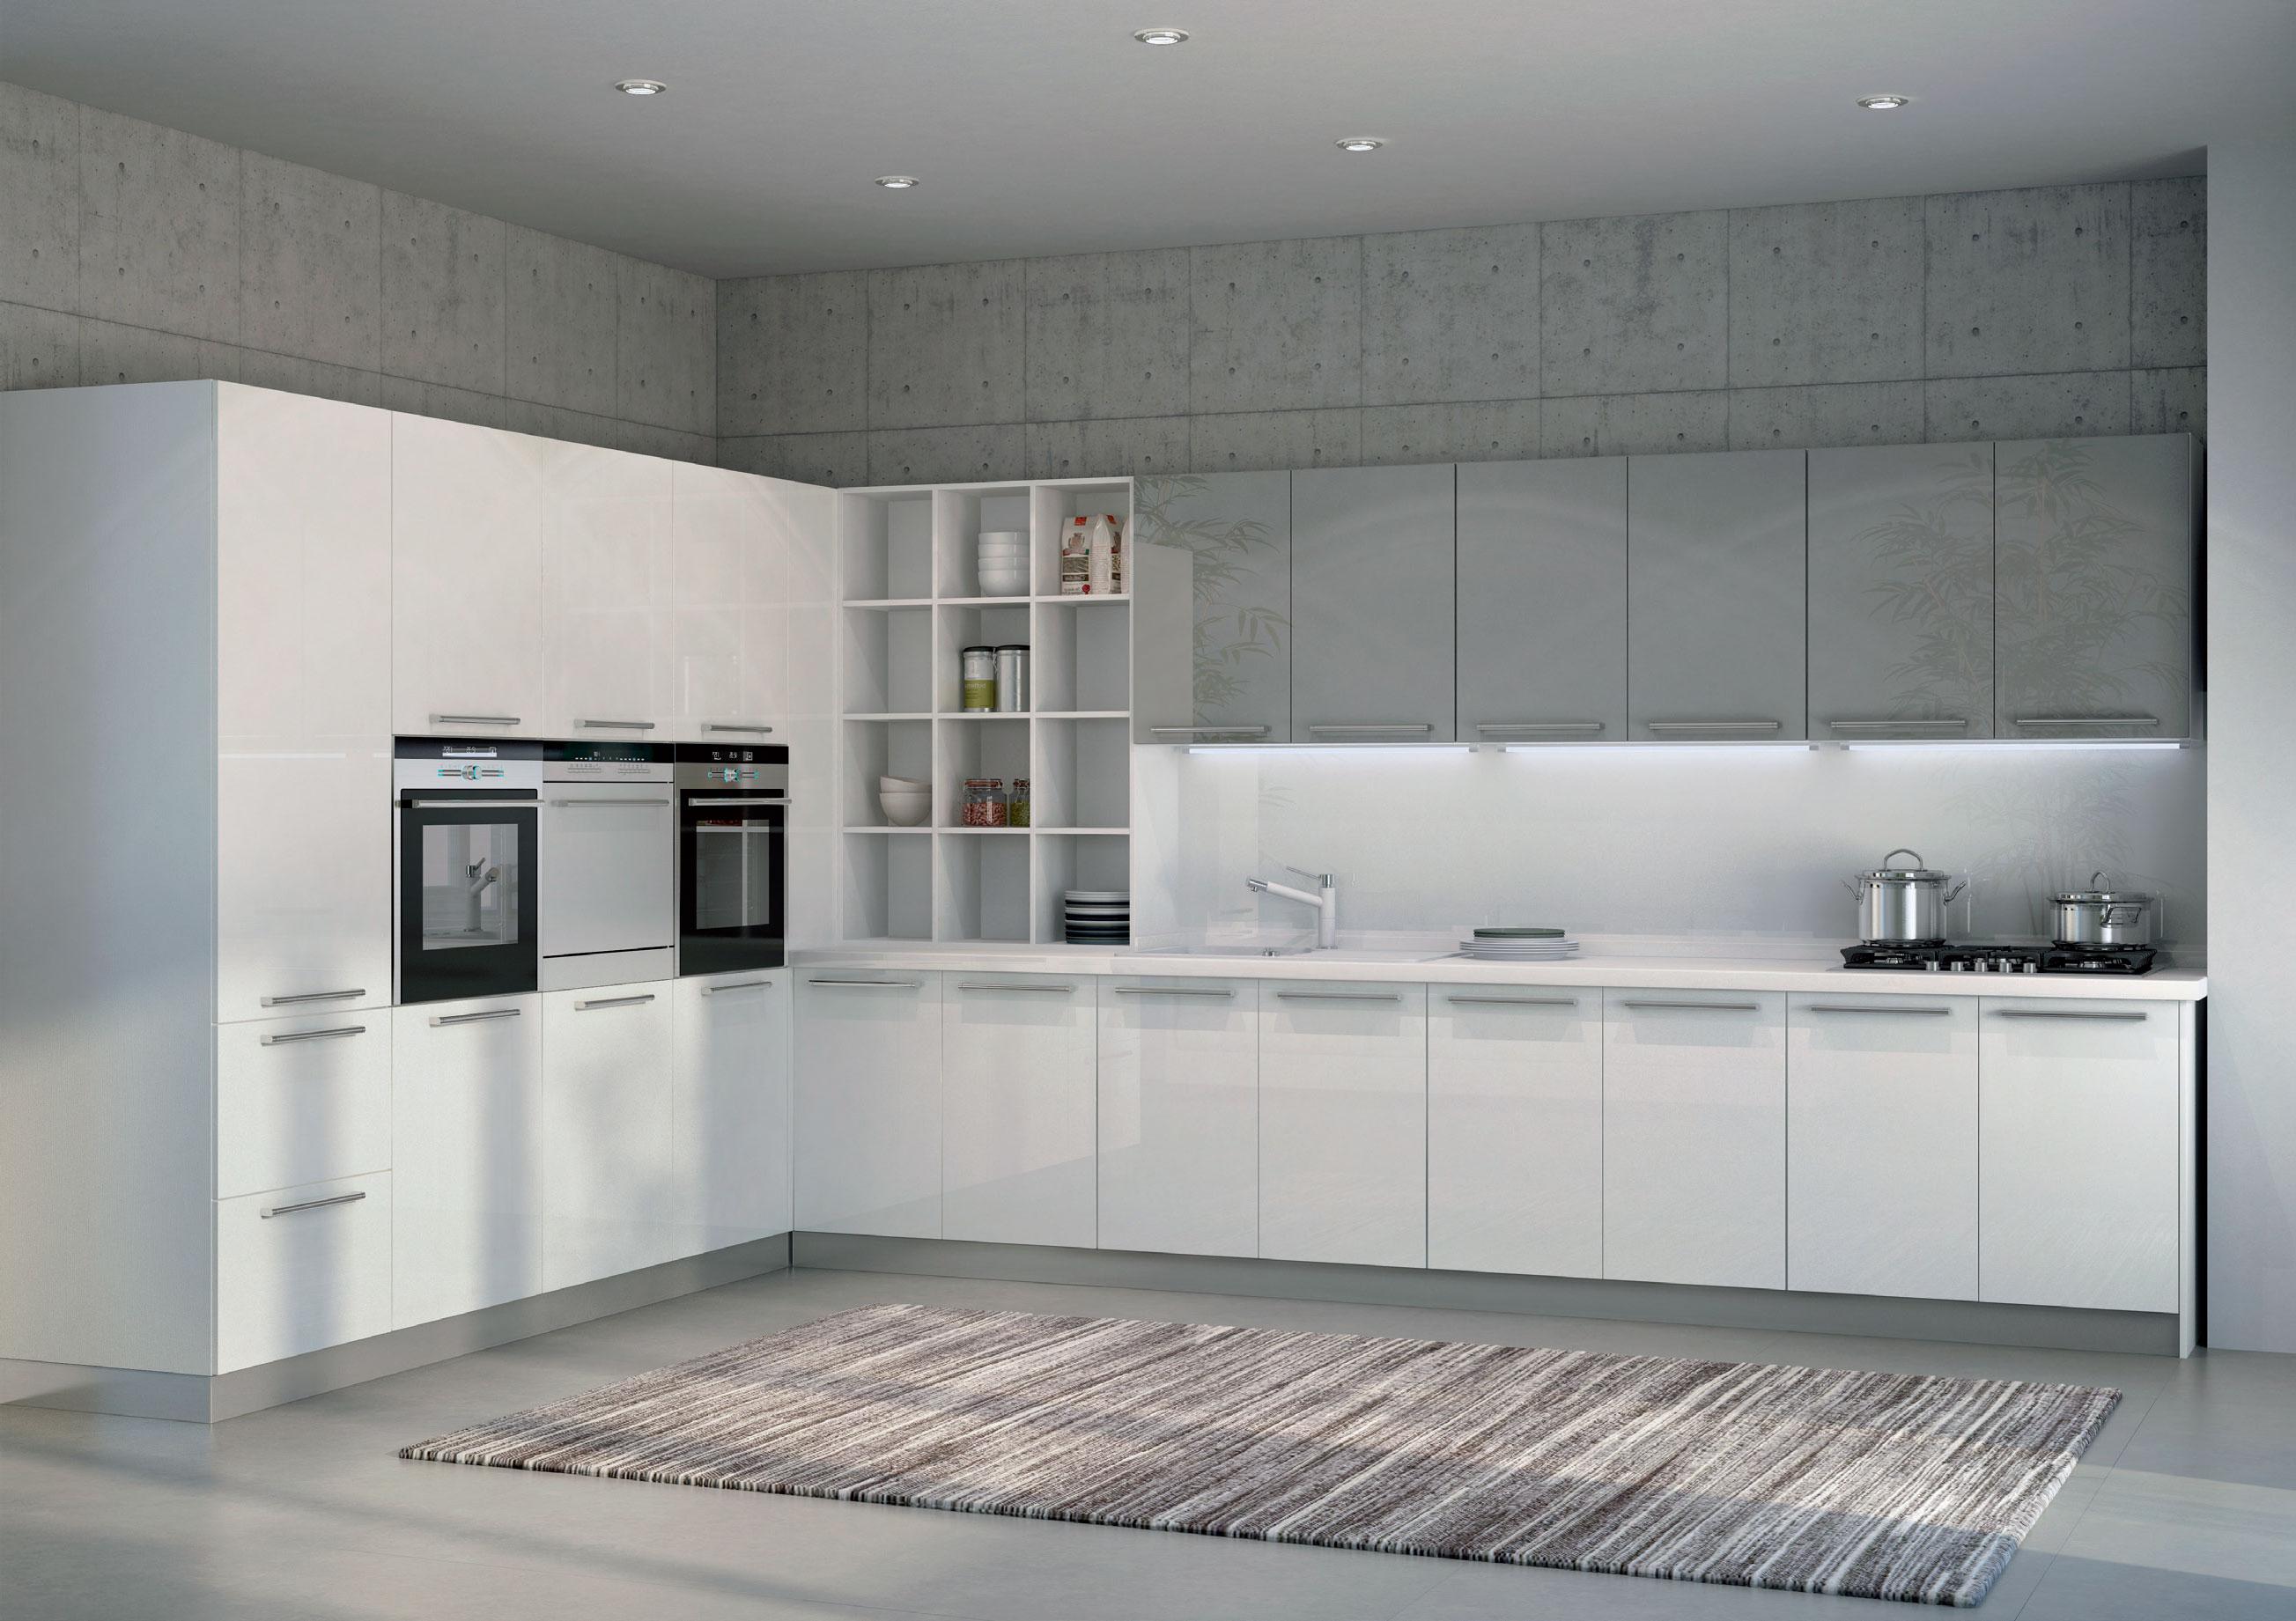 Arredamento in resina per superfici moderne e ricercate elekta linea resine - Parete cucina resina ...